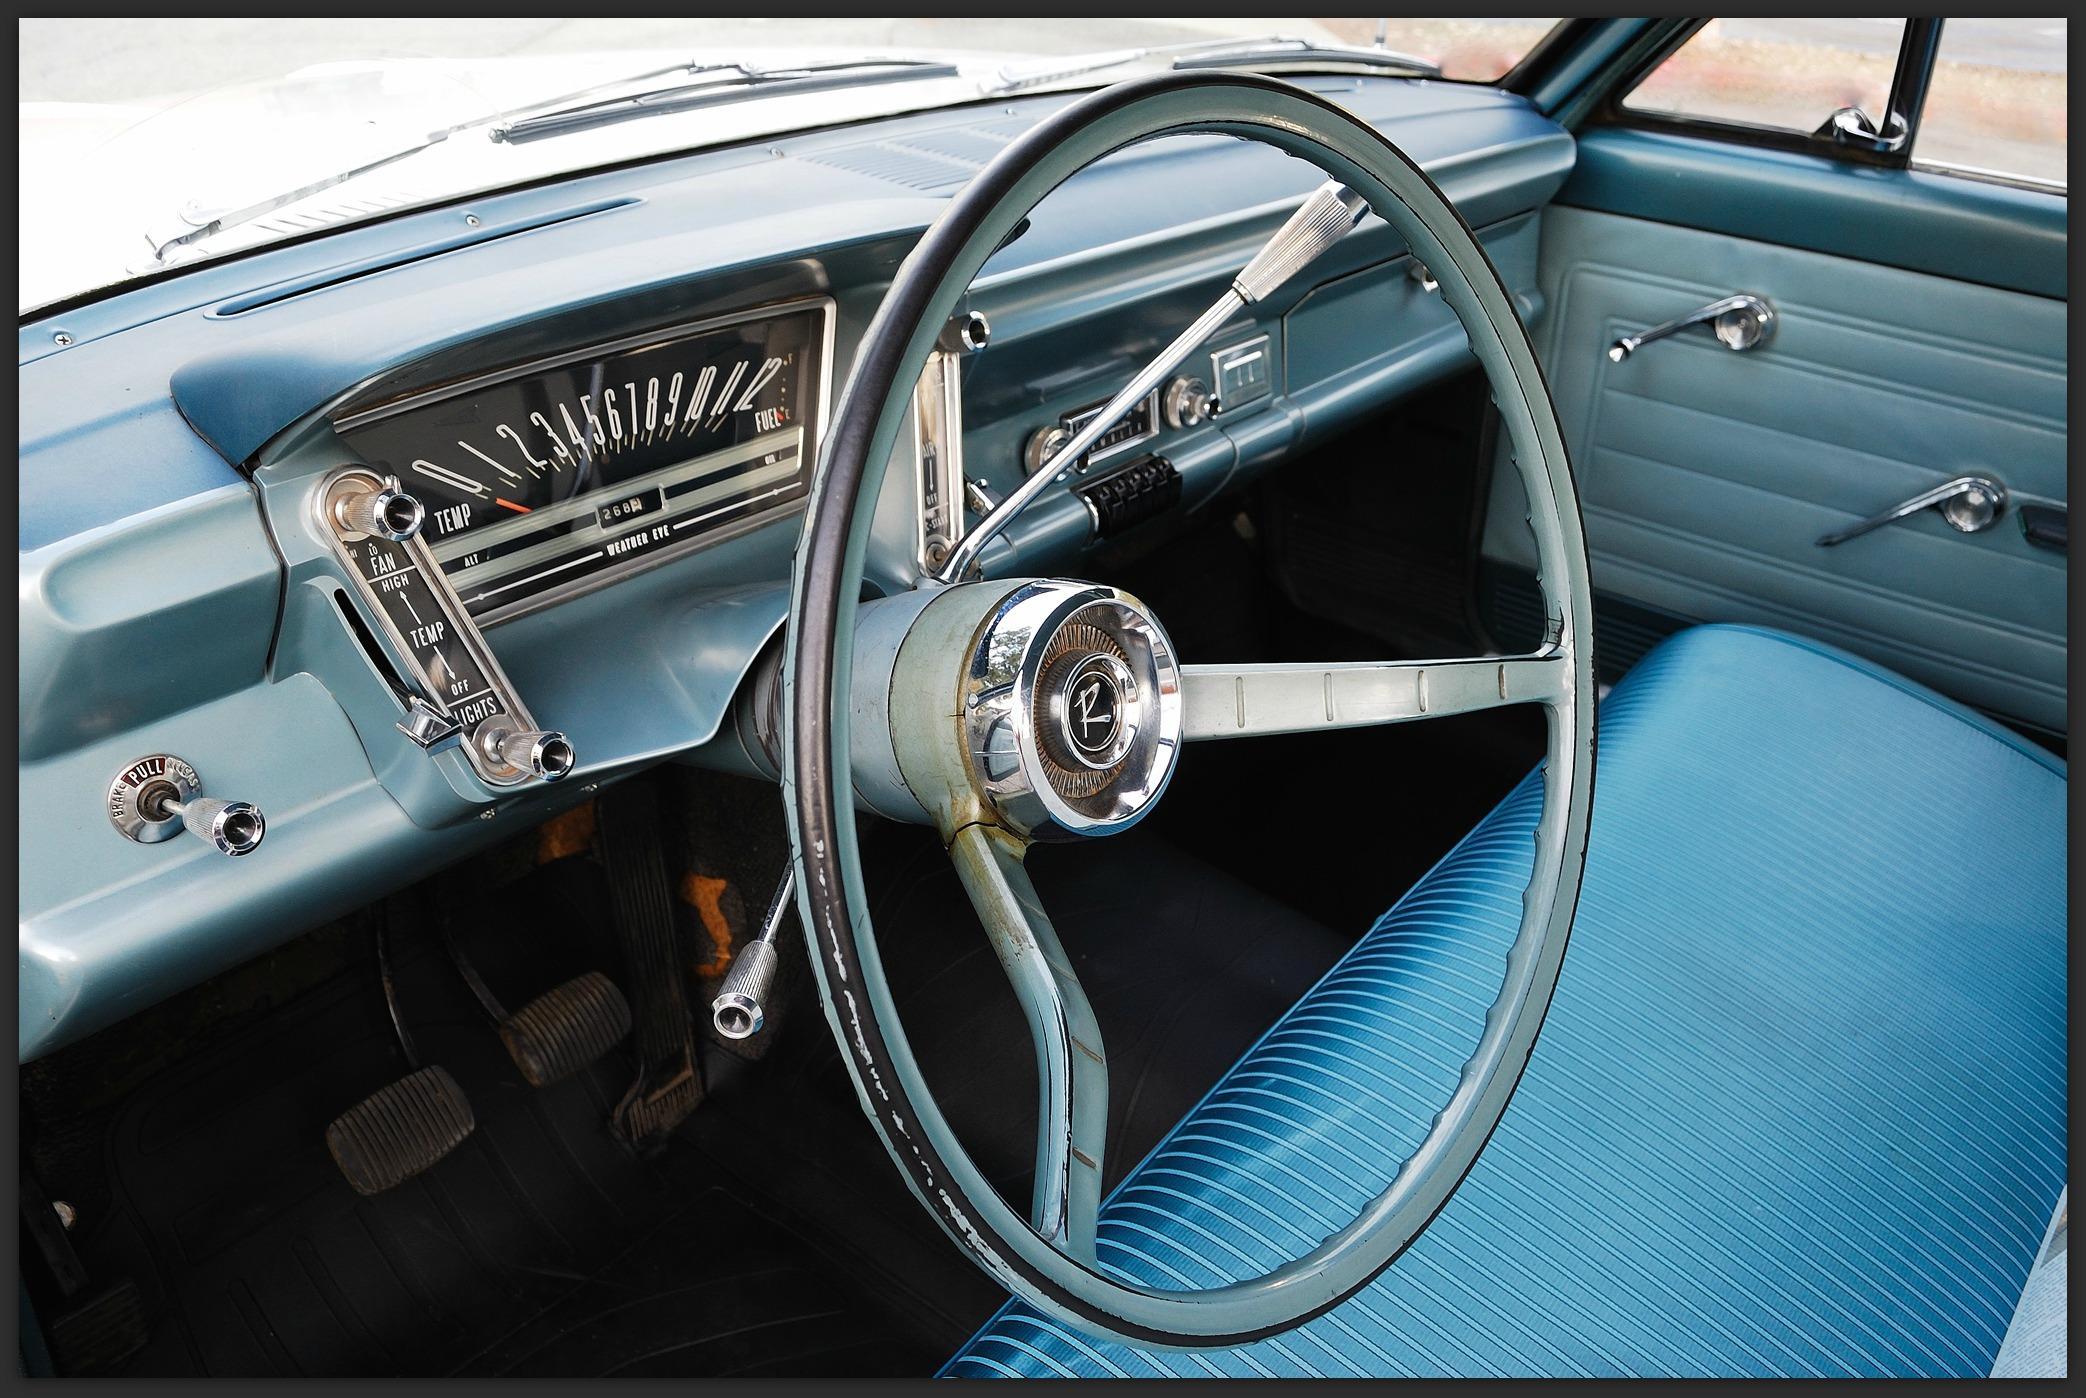 1964 rambler classic,3 speed on the column